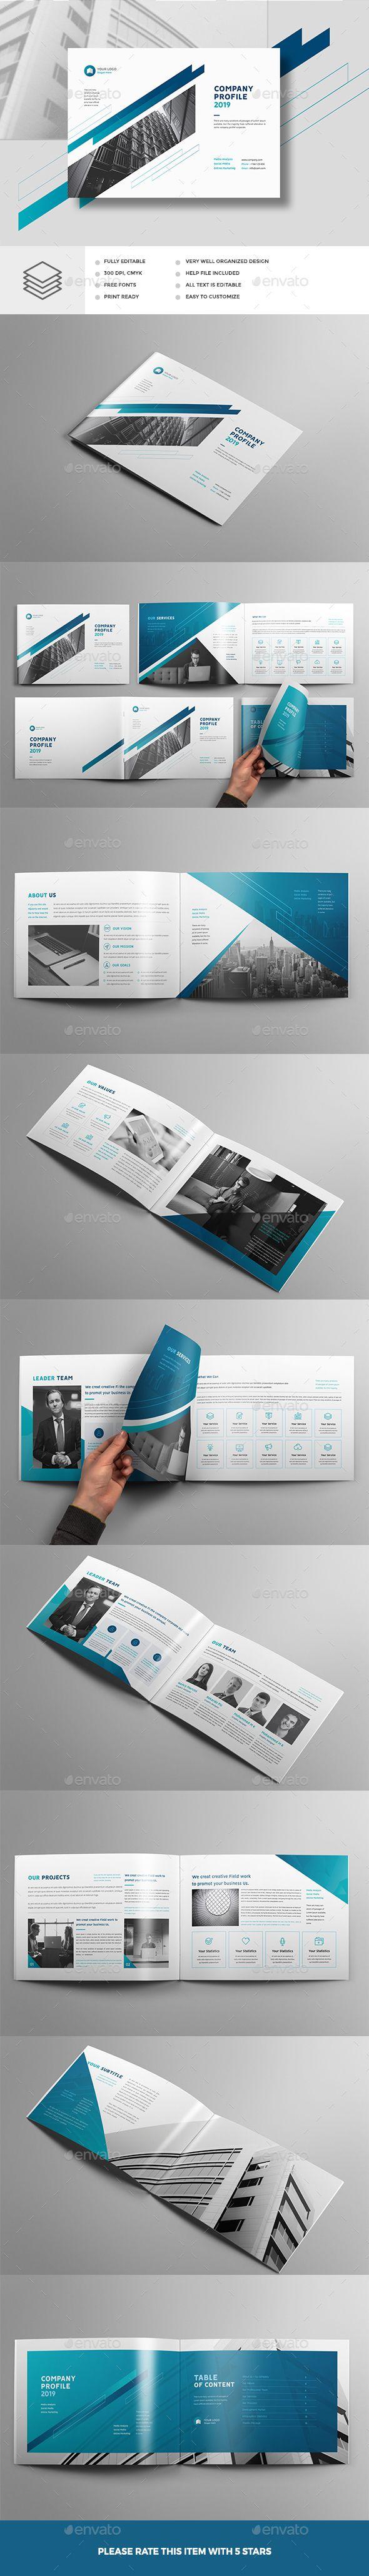 company profile landscape brochure template indesign indd a4 a5